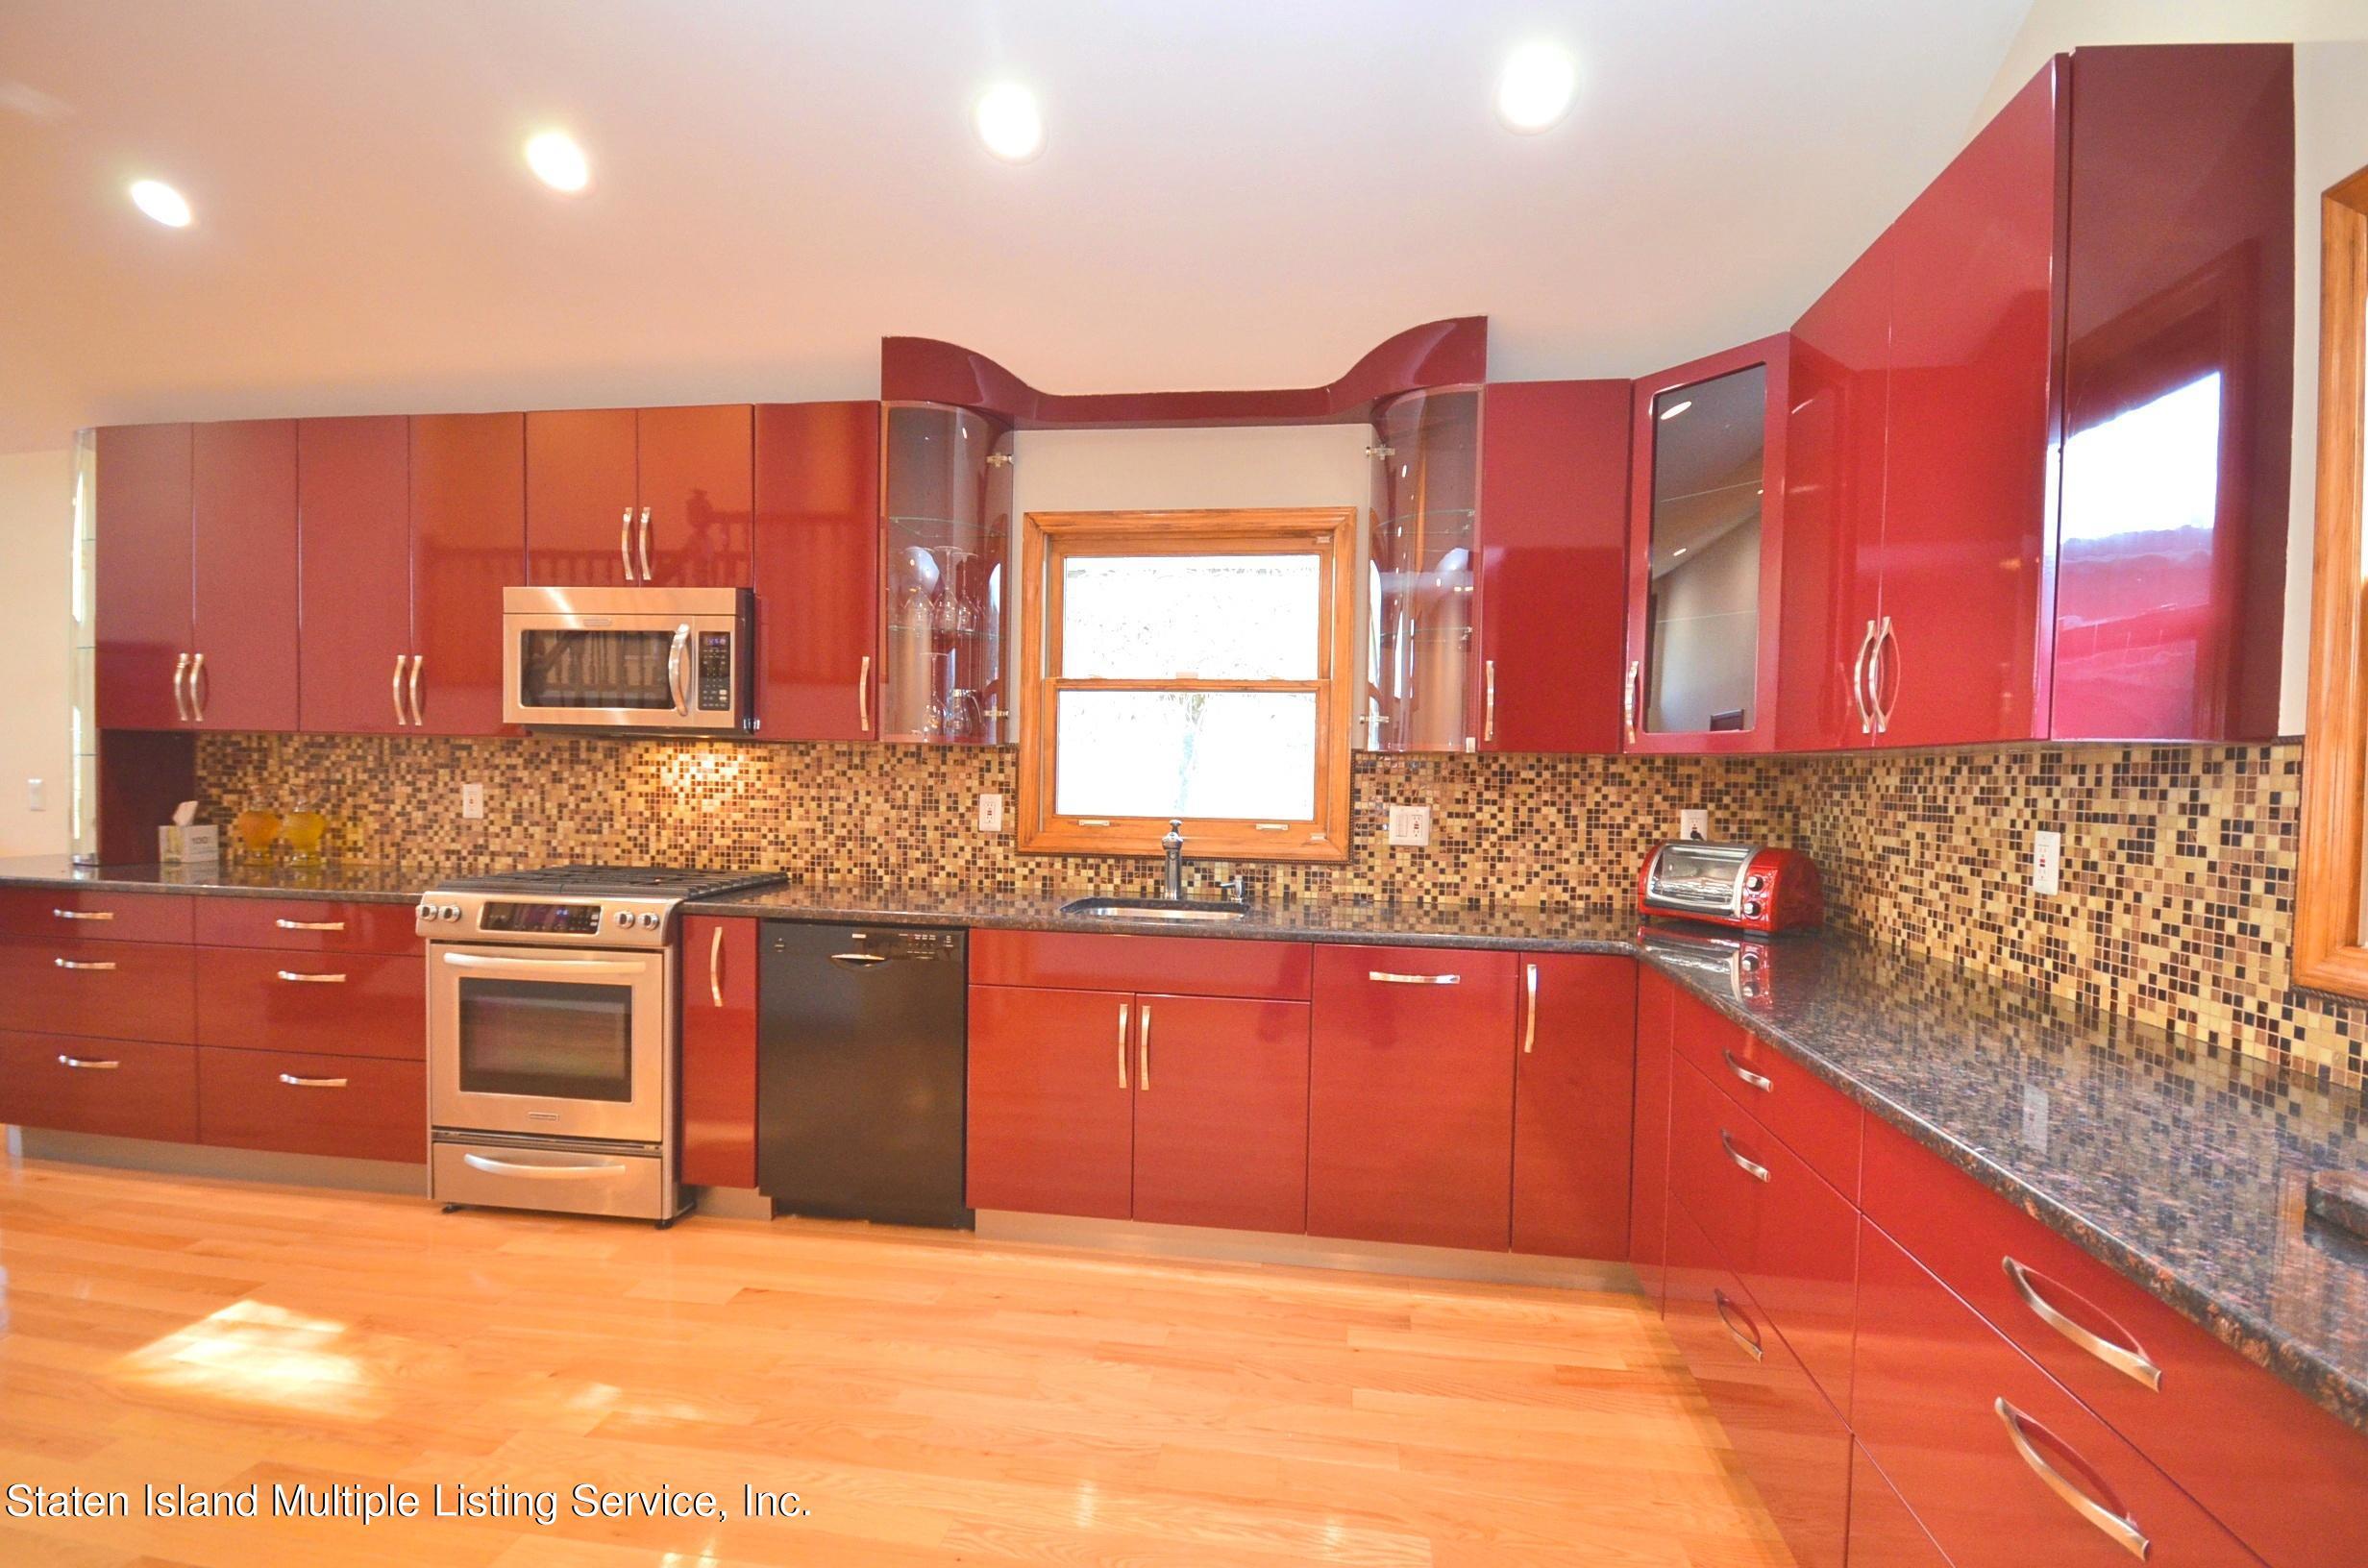 Single Family - Detached 48 Ocean Terrace  Staten Island, NY 10314, MLS-1142240-13